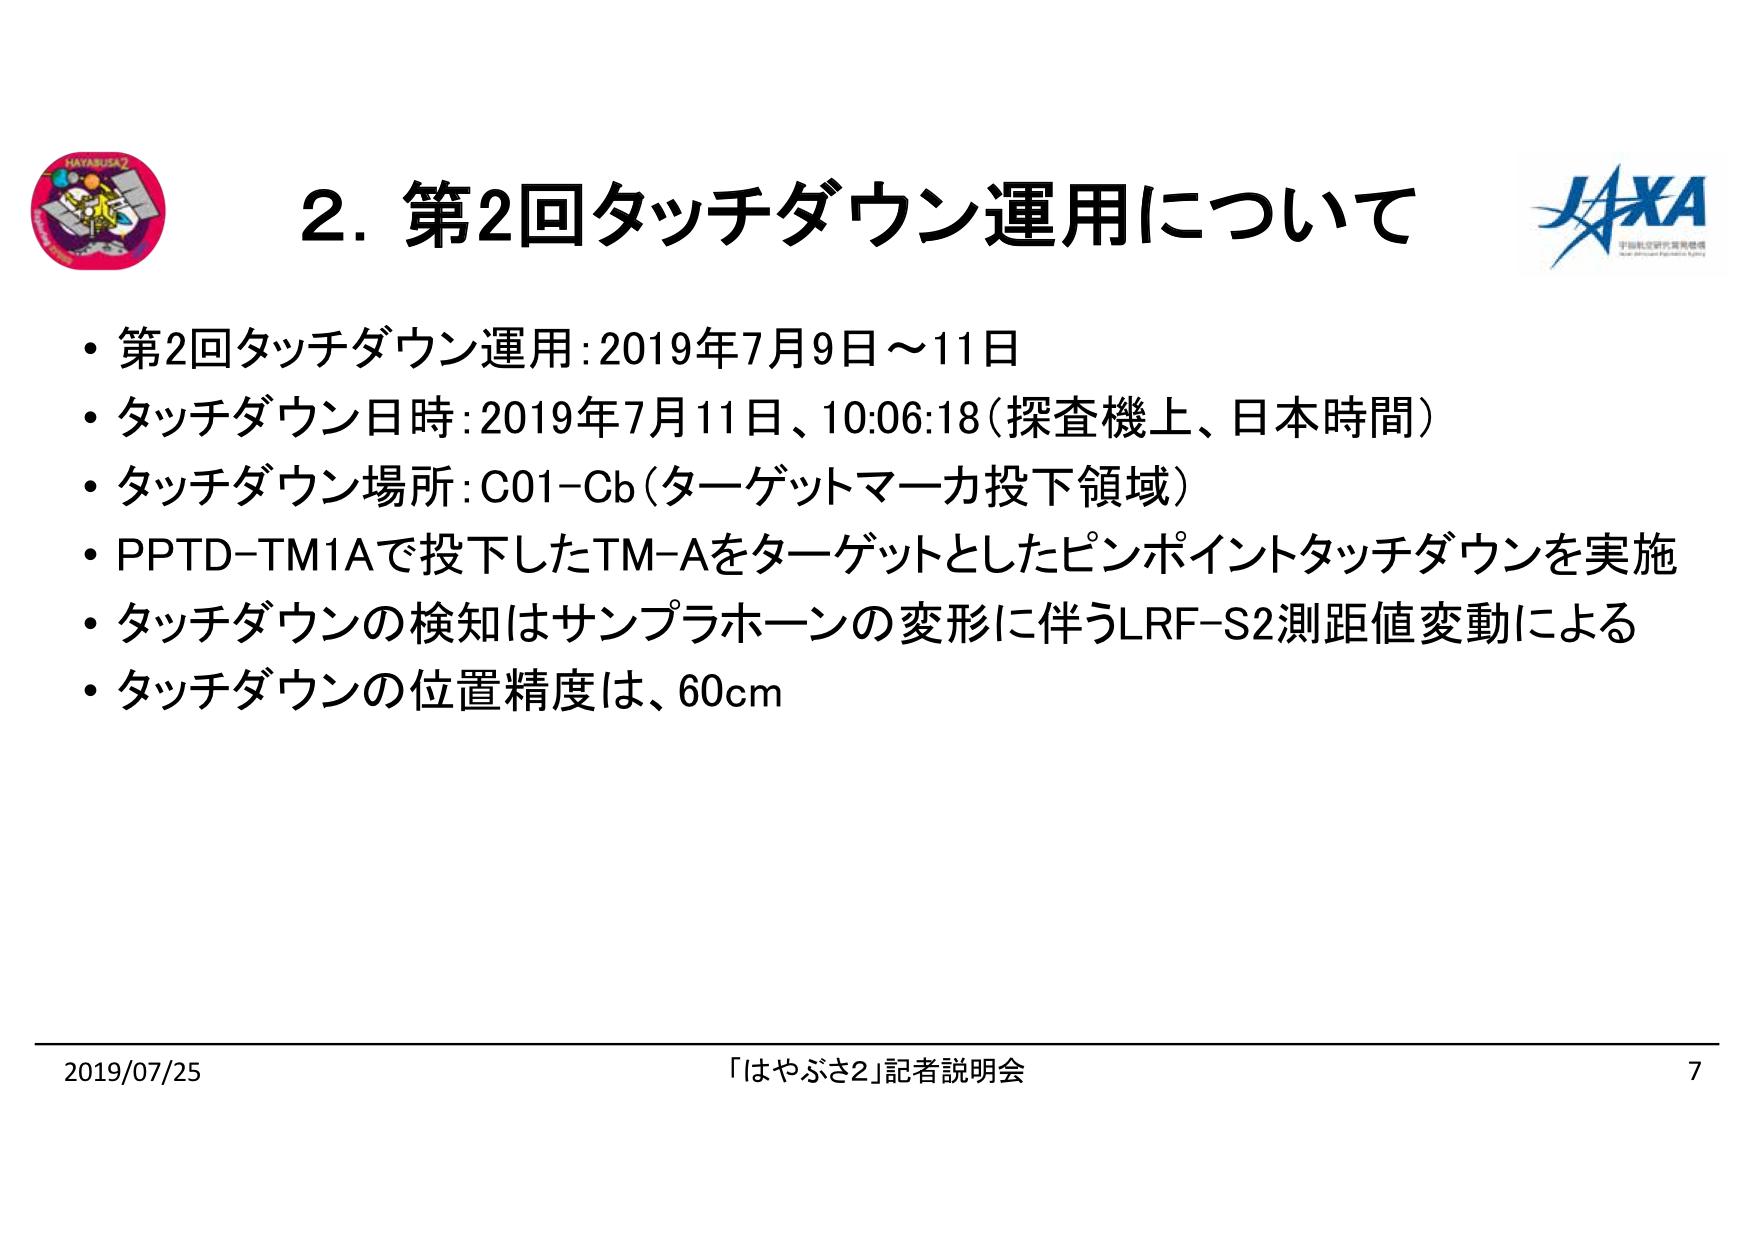 f:id:Imamura:20190725151111p:plain